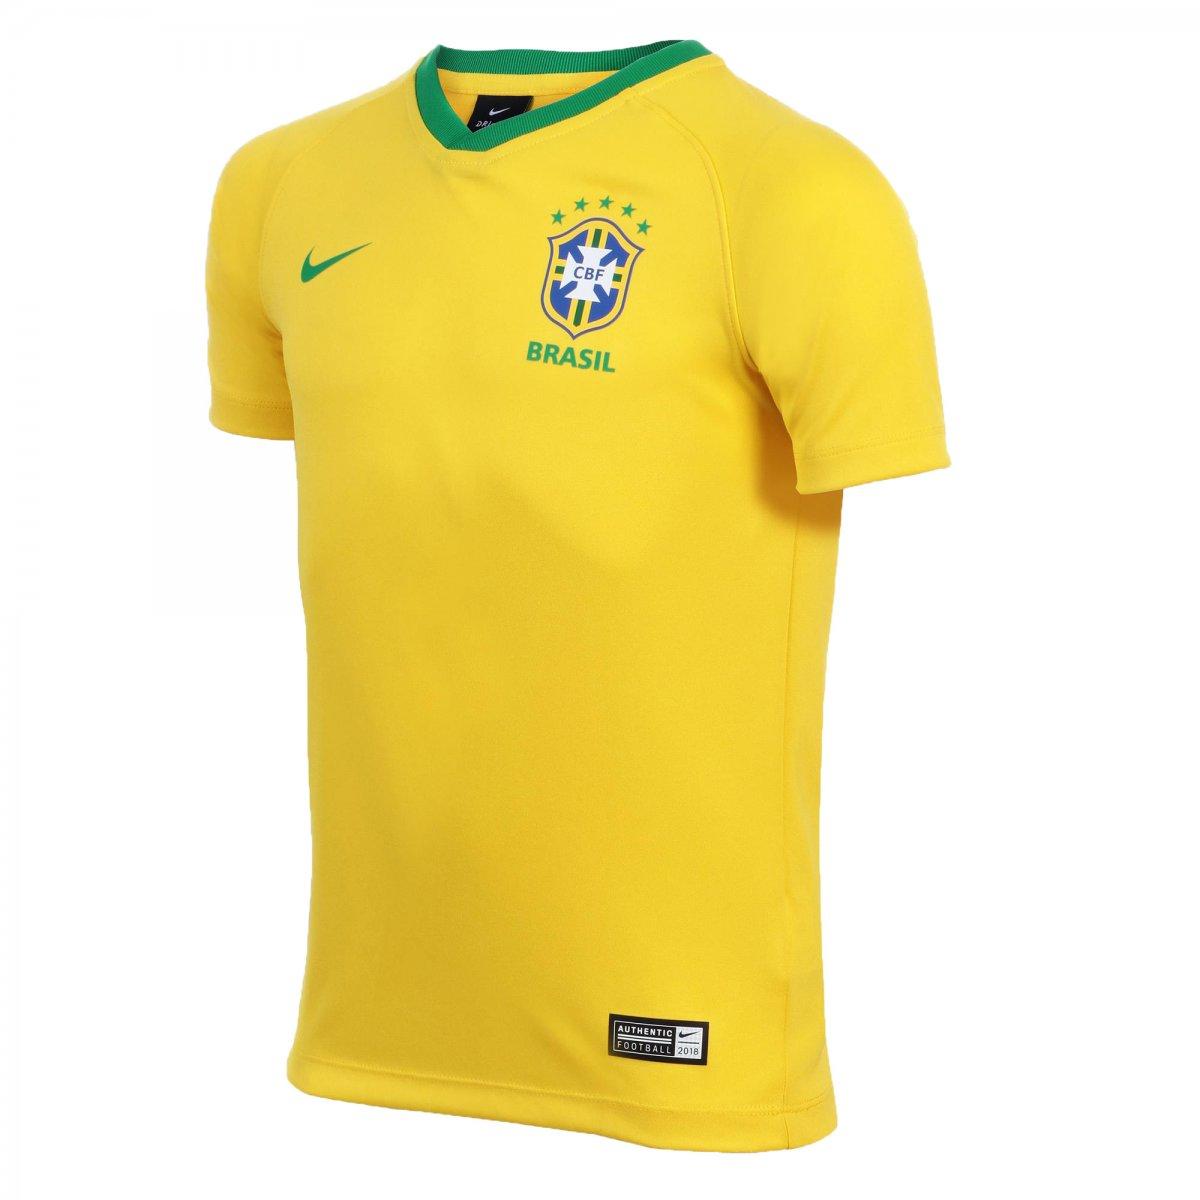 04c85aa725 Camisa Infantil Nike CBF Brasil Torcedor Estádio 2018 19 AA2886-749 Amarelo